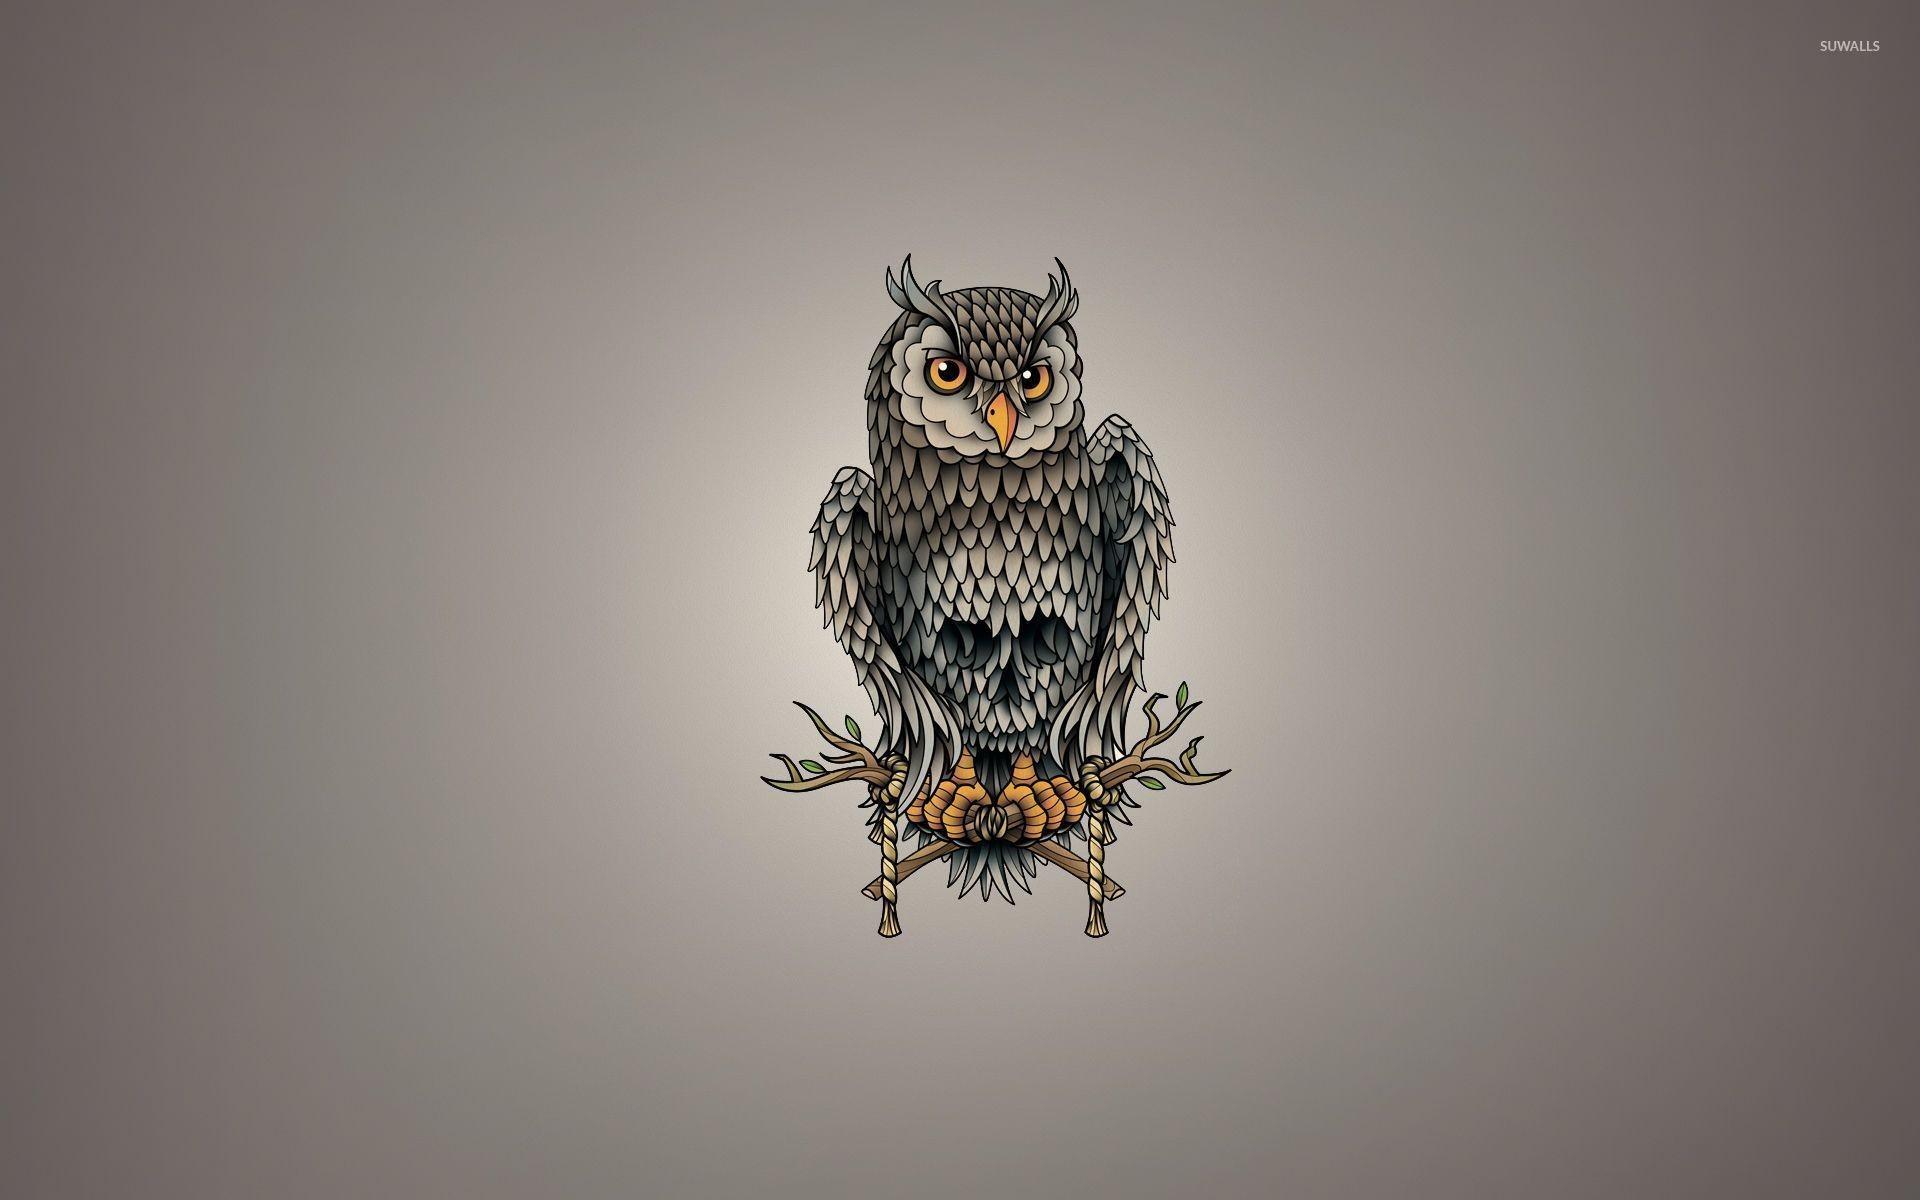 Skull owl wallpaper jpg